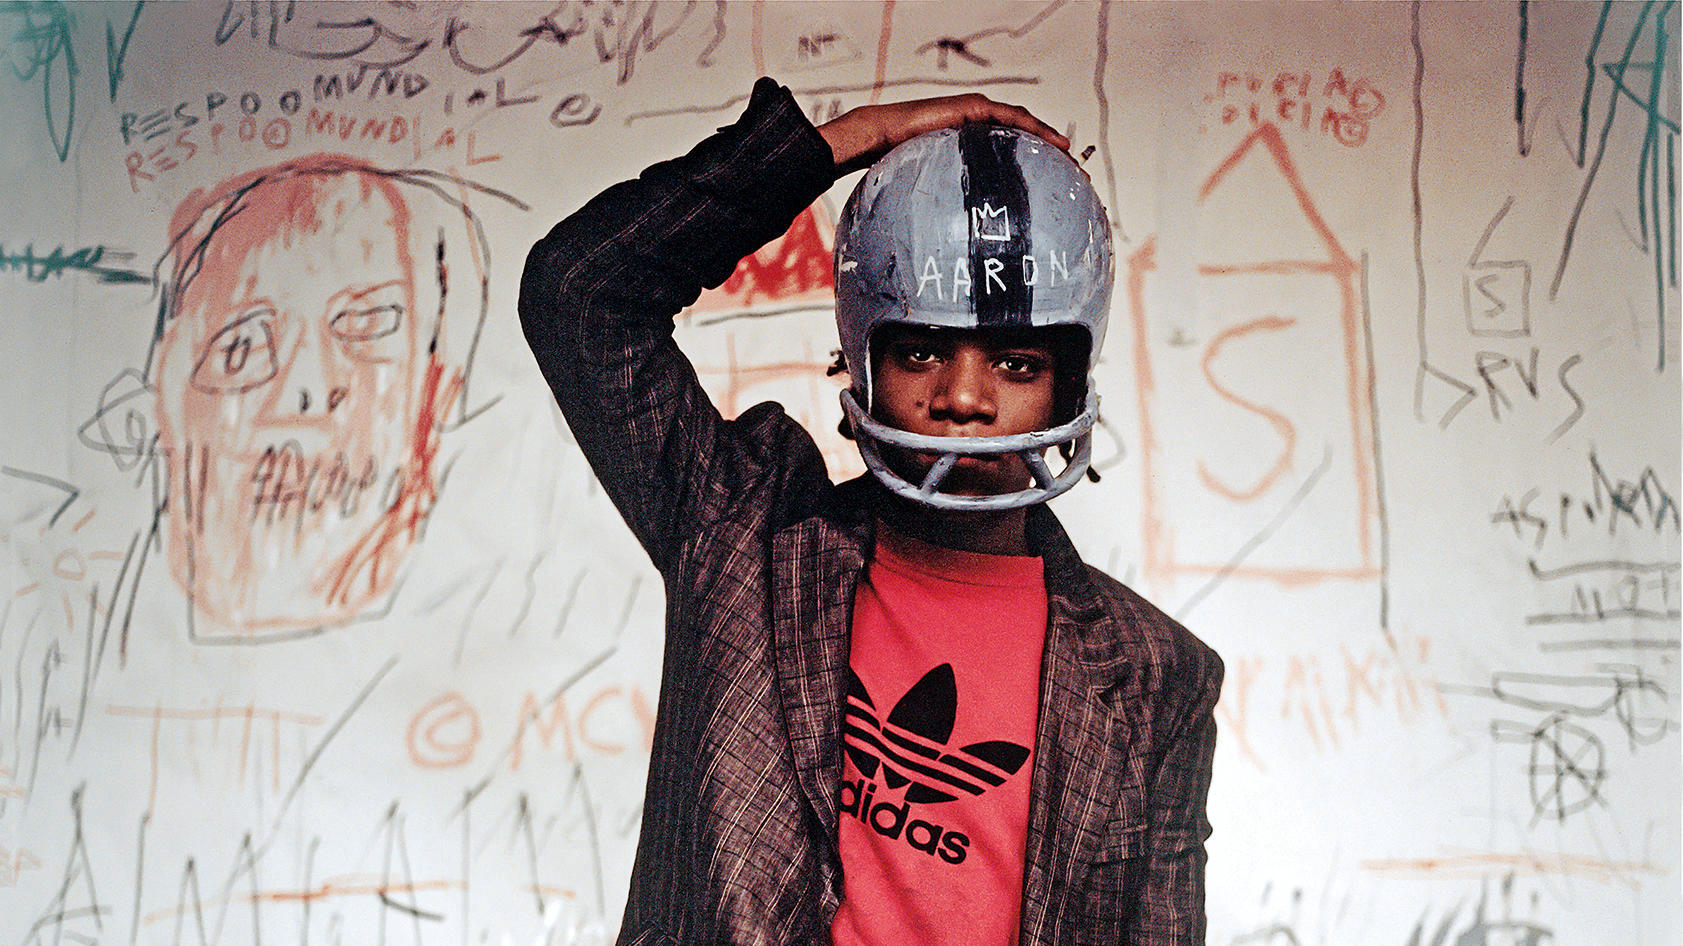 "Едо Бертолио. ""Жан-Мишел Баскиа в шлем за ижгра на американски футбол. 1981 г."" (фрагмент). Photo: © Edo Bertoglio, courtesy of Maripol. Artwork: © The Estate of Jean-Michel Basquiat. Licensed by Artestar, New York"